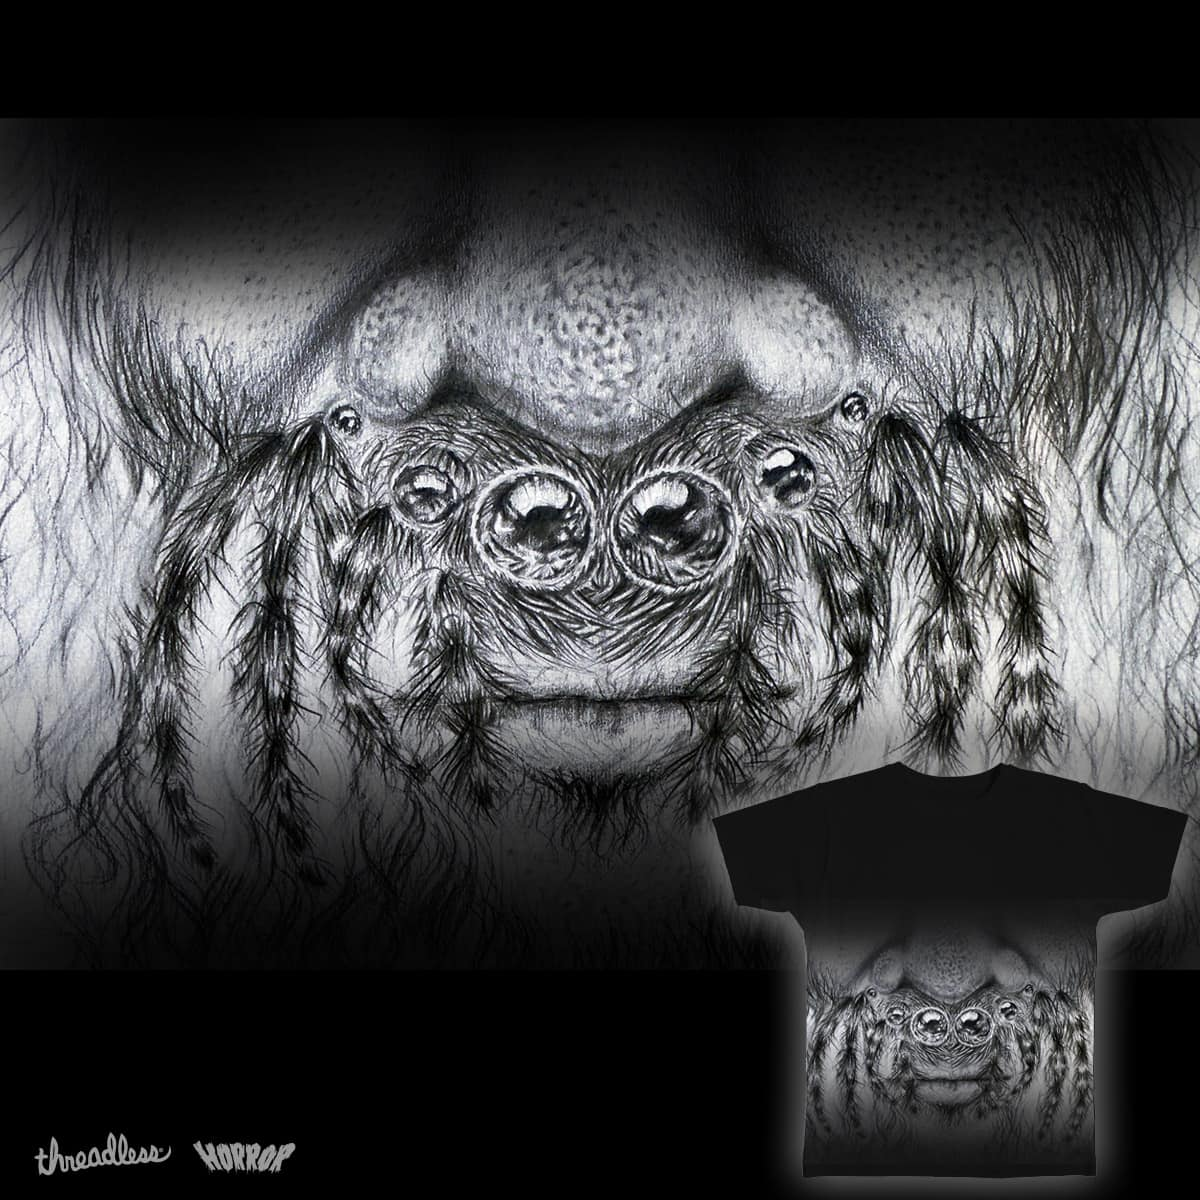 Spiderbeard by Somyay on Threadless